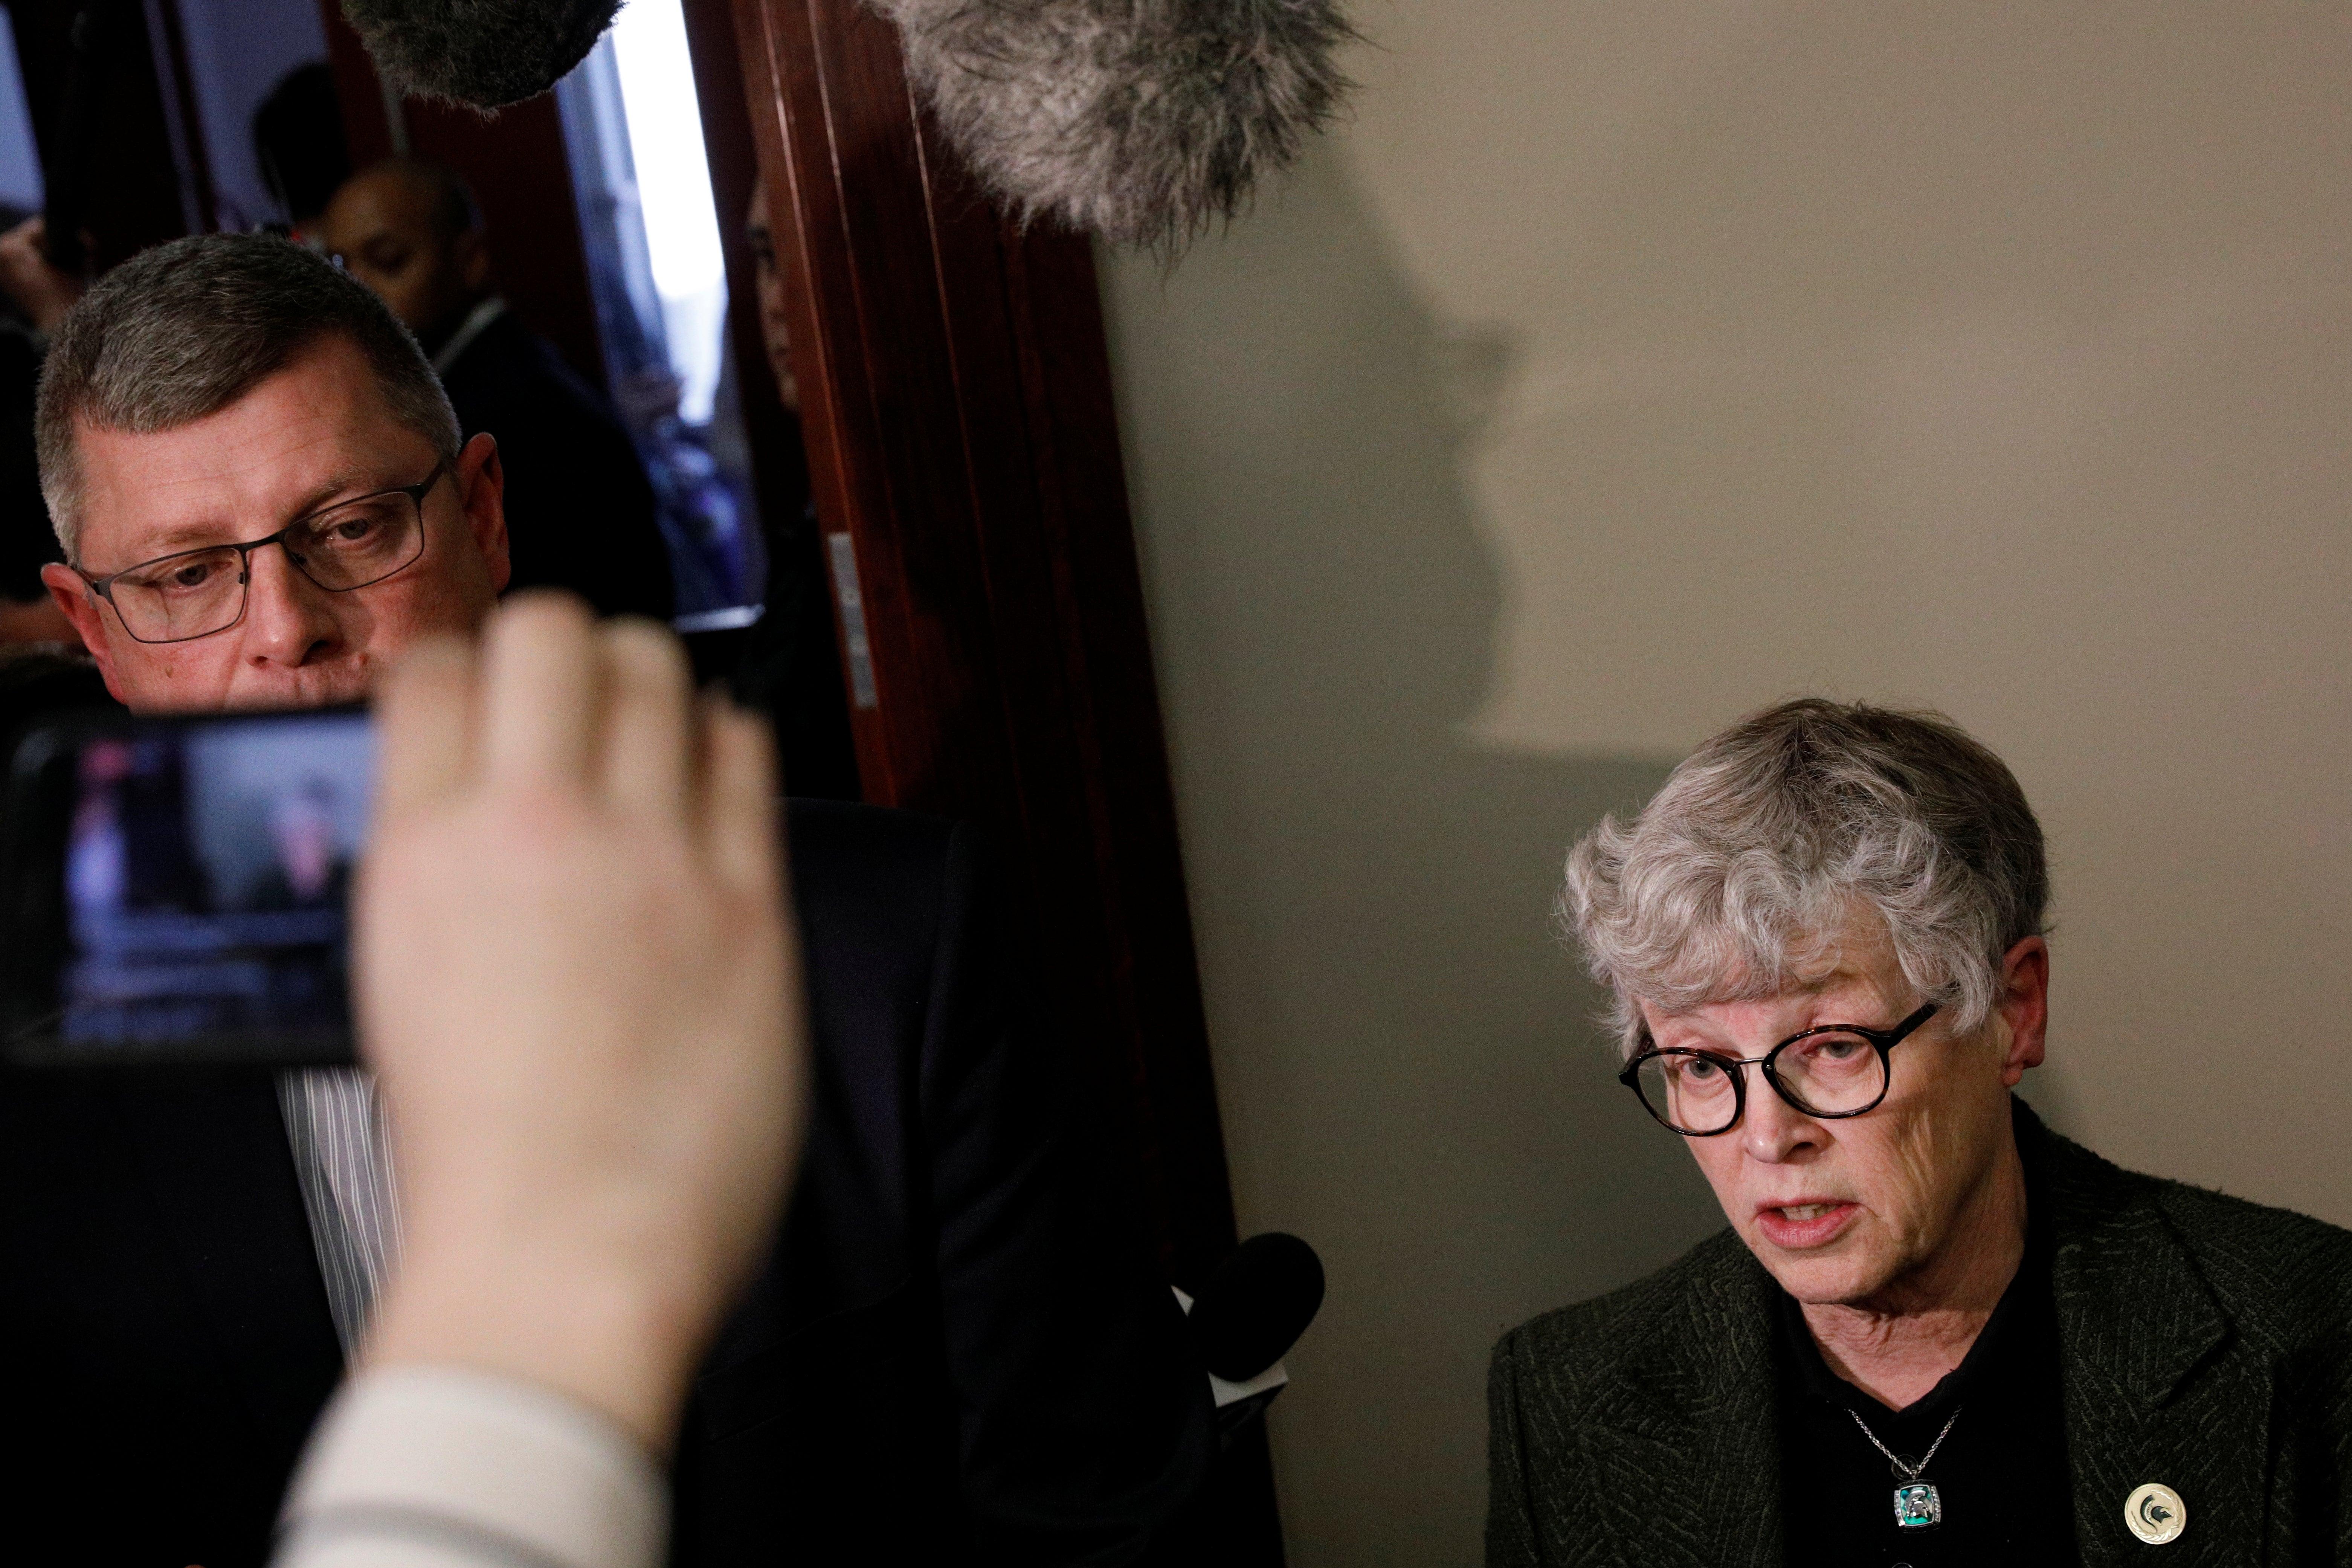 Michigan State president Lou Anna Simon outside Larry Nassar's sentencing hearing on Wednesday in Lansing, Michigan.